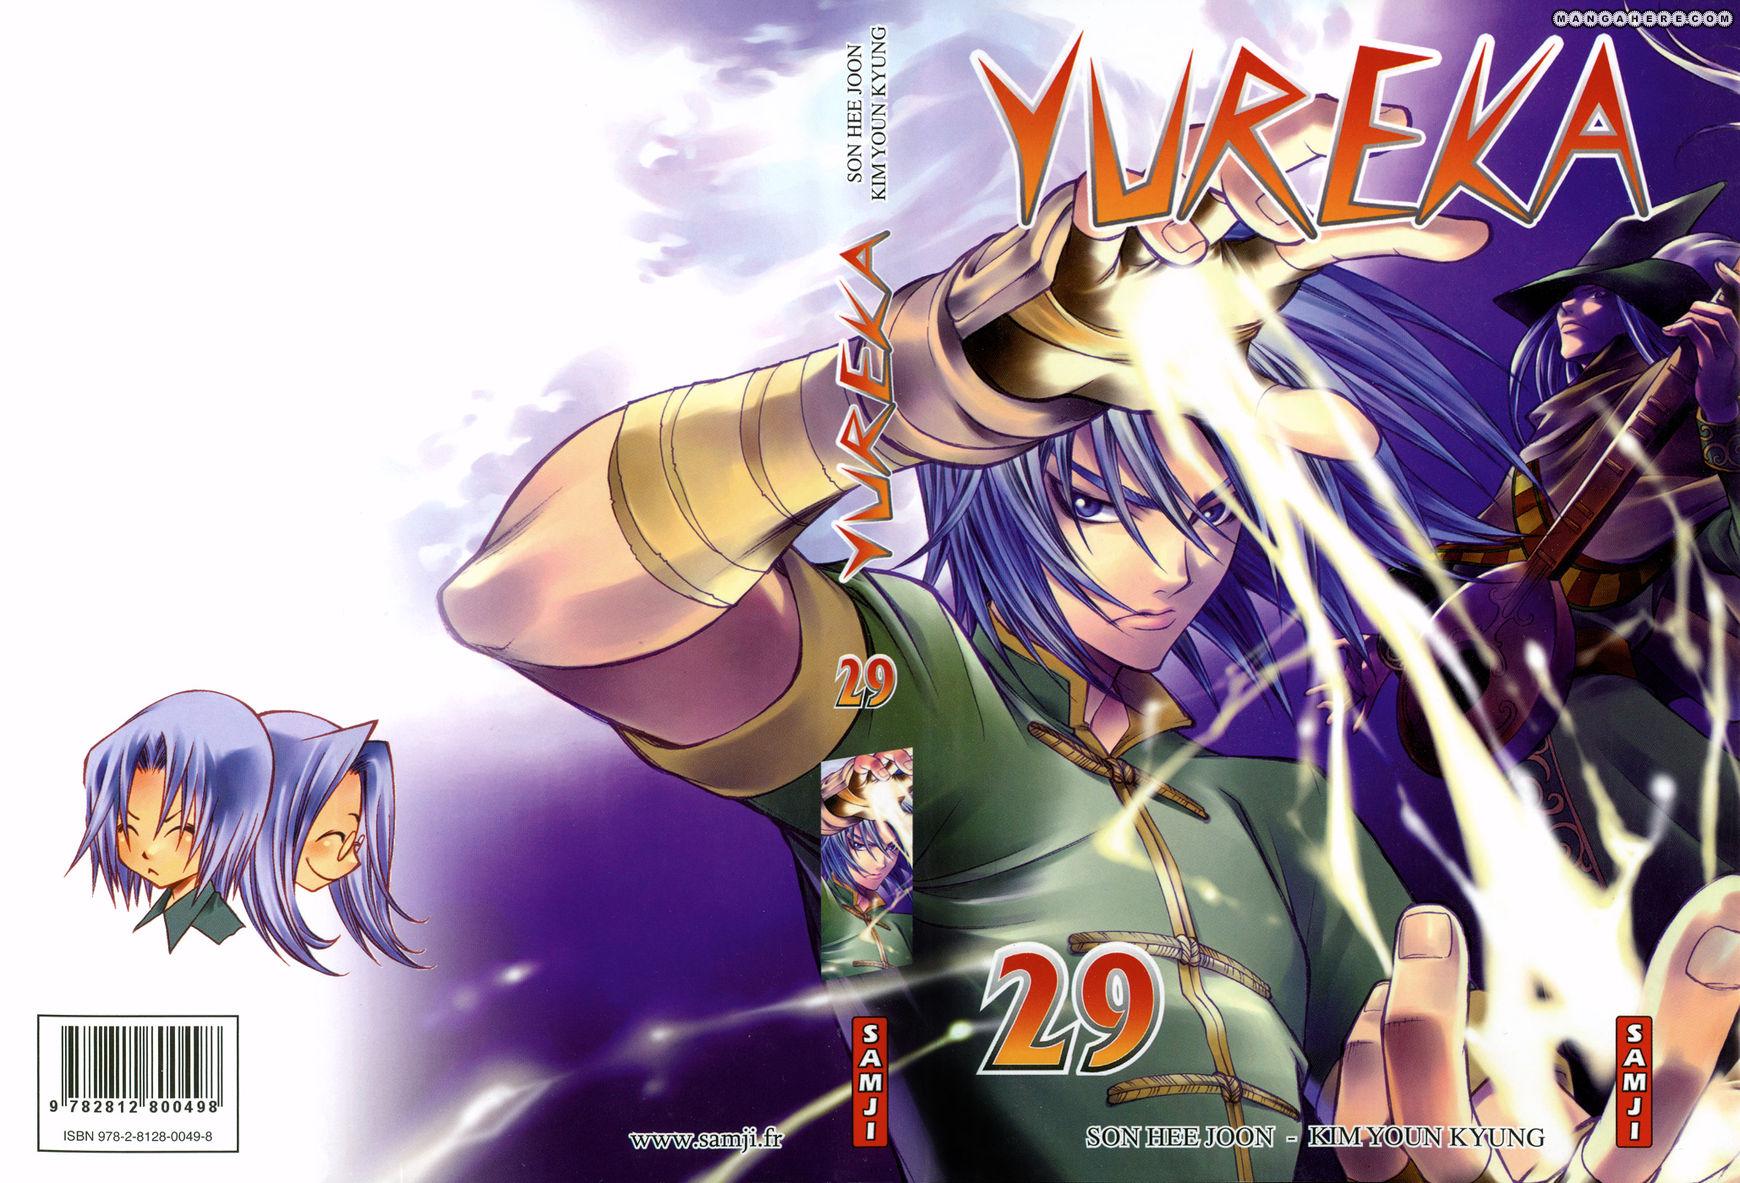 Yureka 176 Page 1